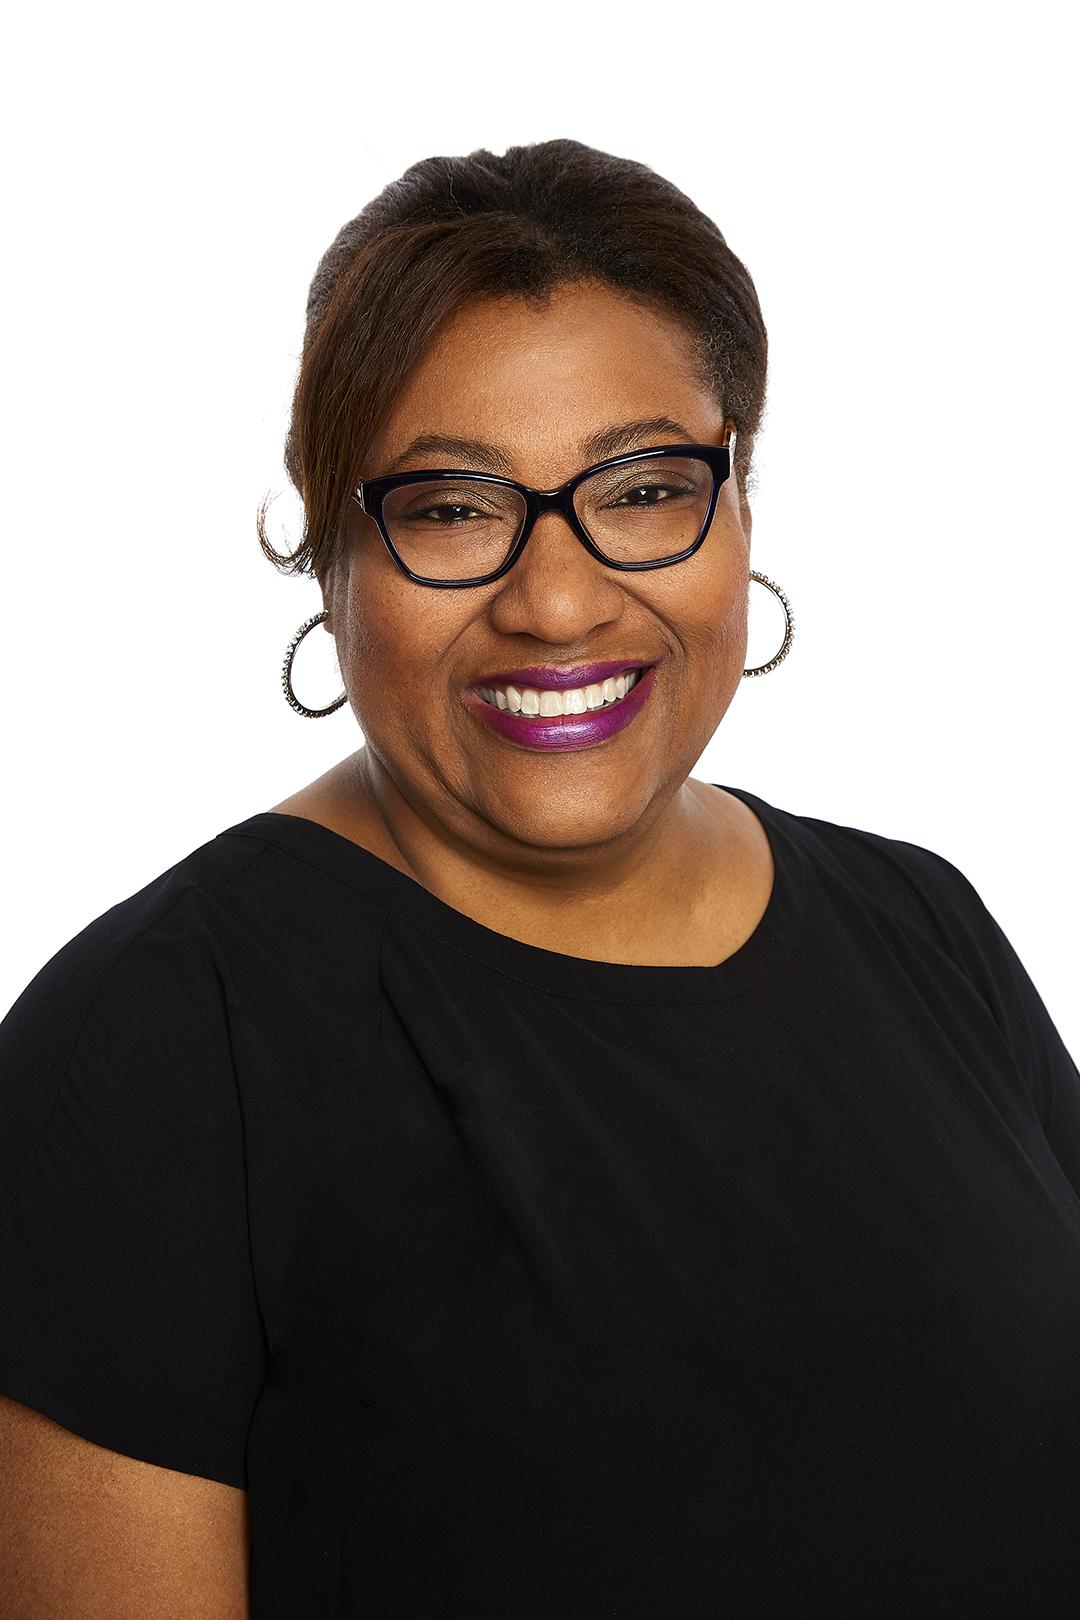 Lynne Coleman: JCPenney SR. Divisional Brand Management Director For Women's Apparel